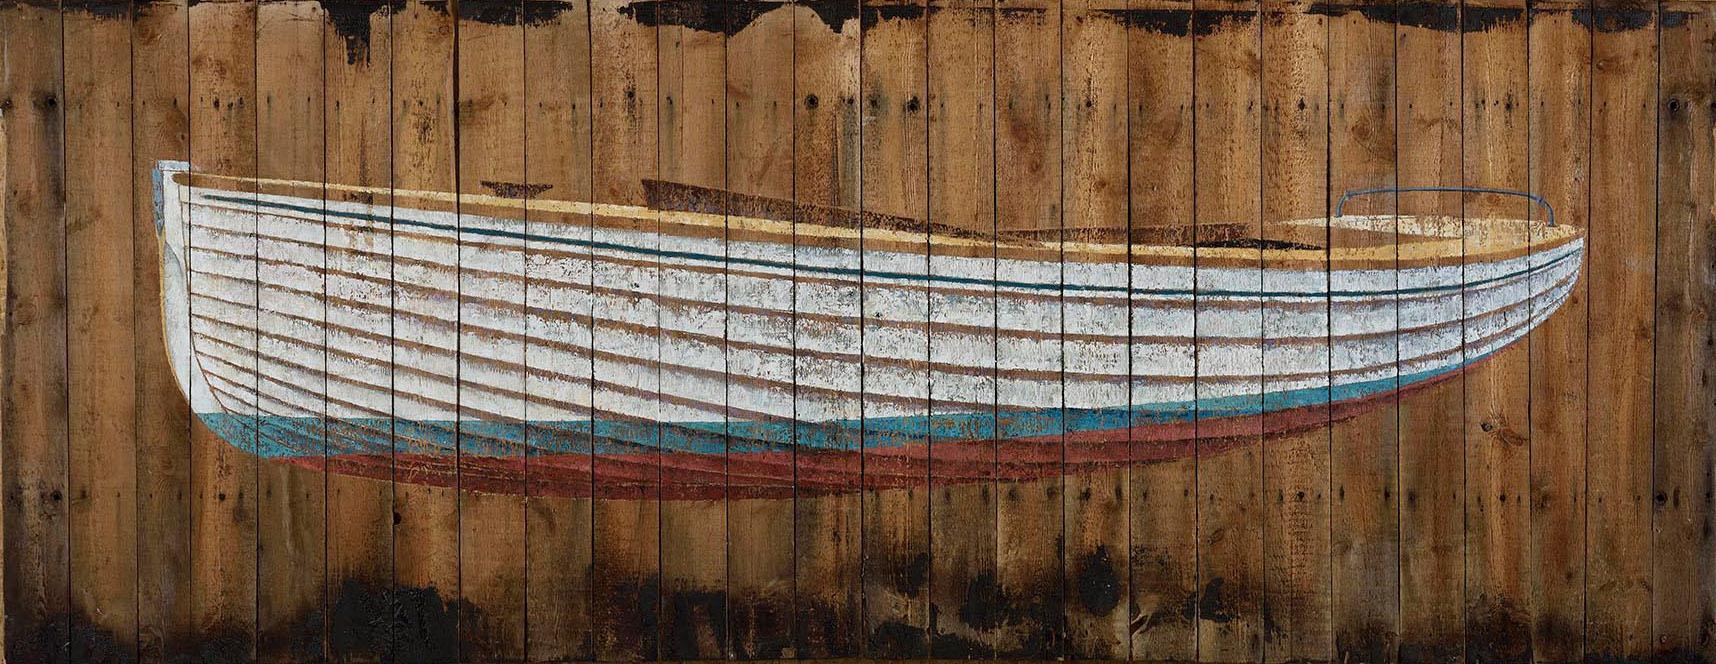 Number 1  (Brightlingsea One Design) 2015. 130 x 335cm Oil on beach hut roof. © James Dodds